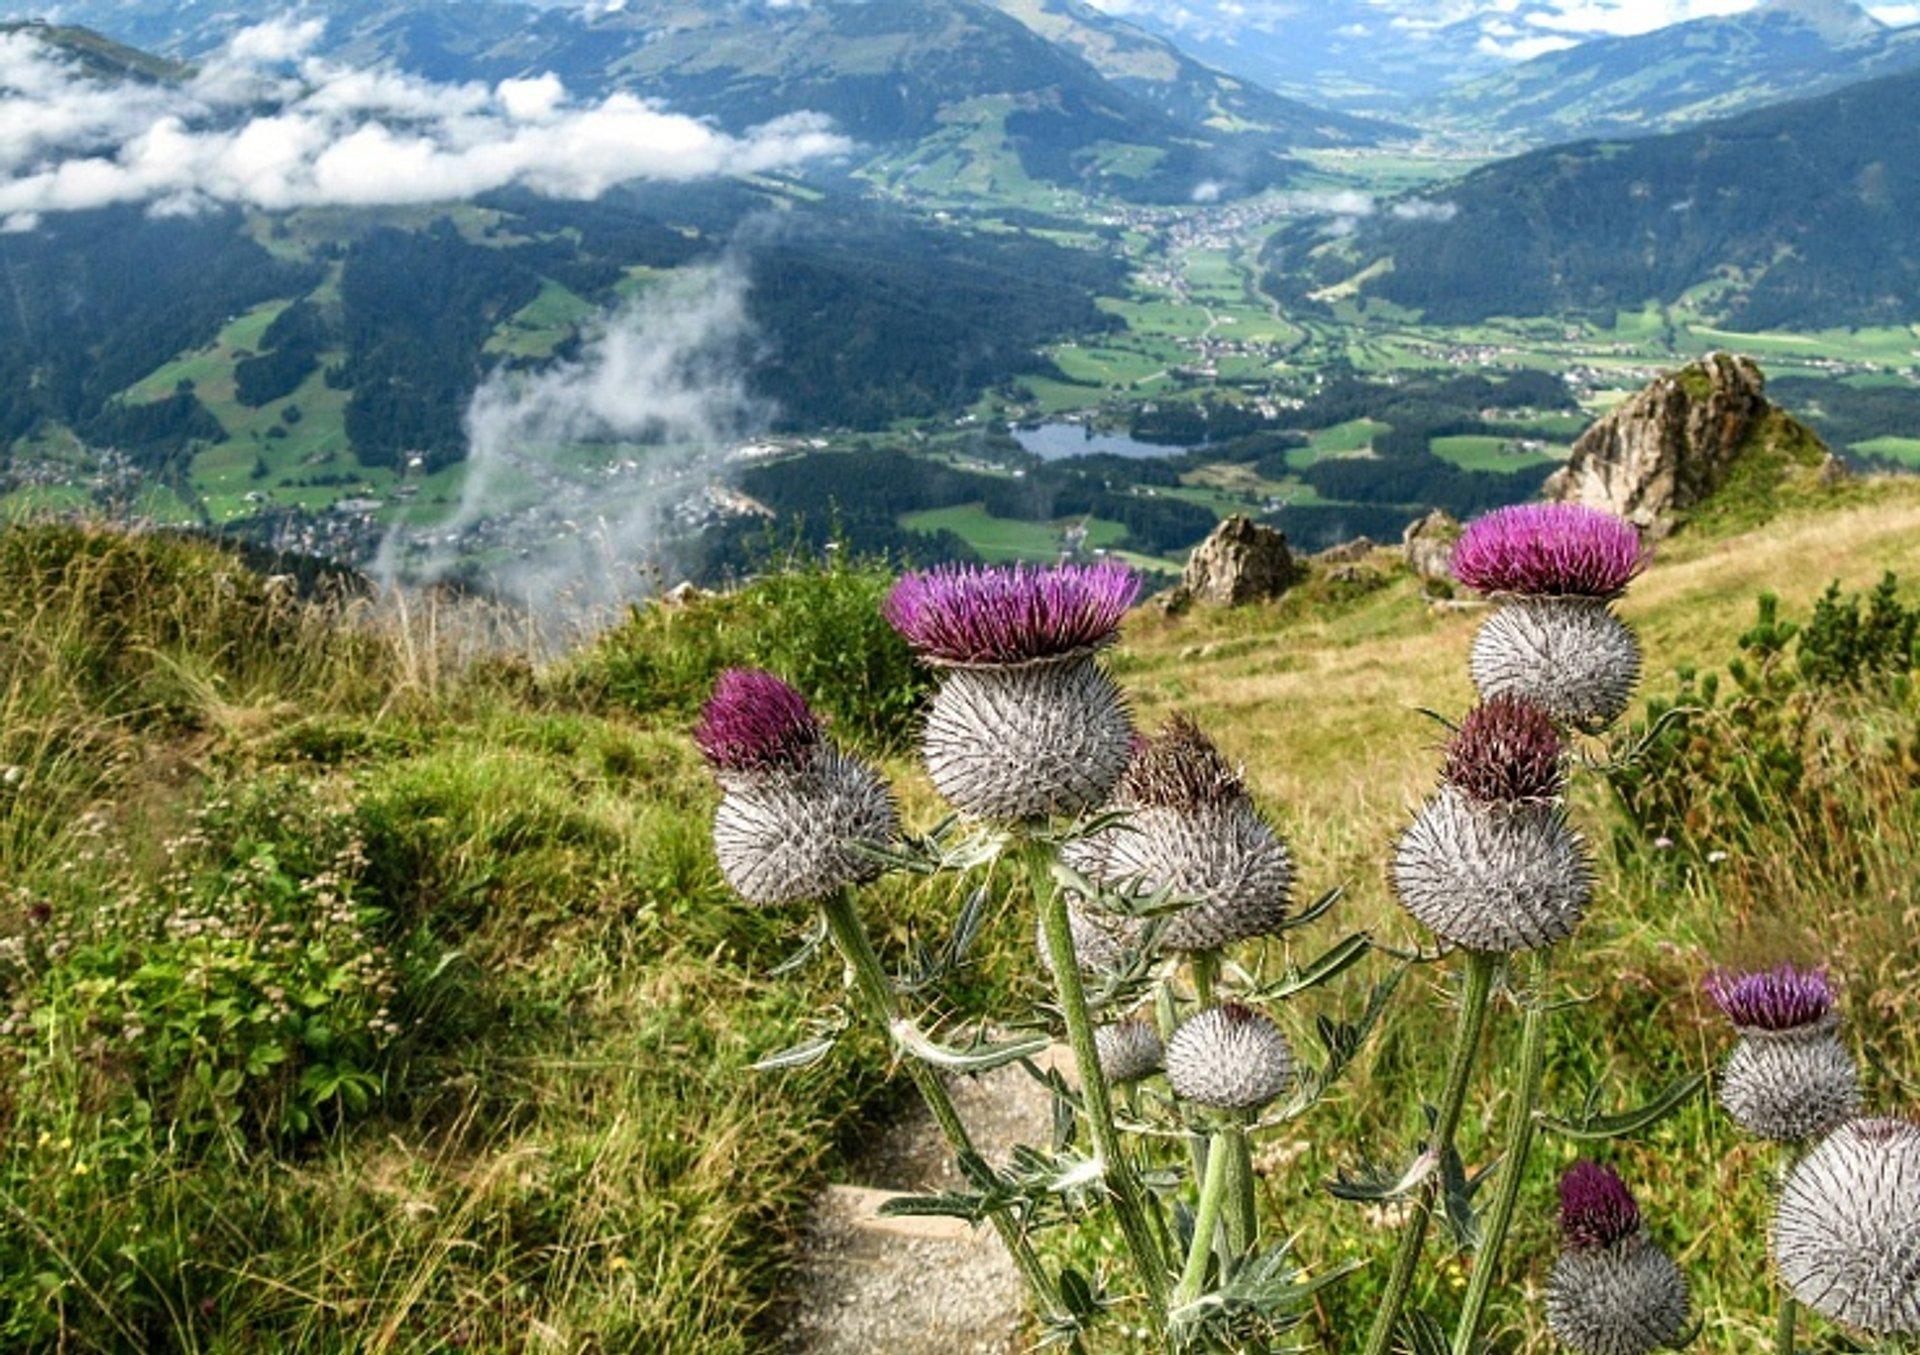 Alpine Flower Garden Kitzbüheler Horn in Austria 2020 - Best Time